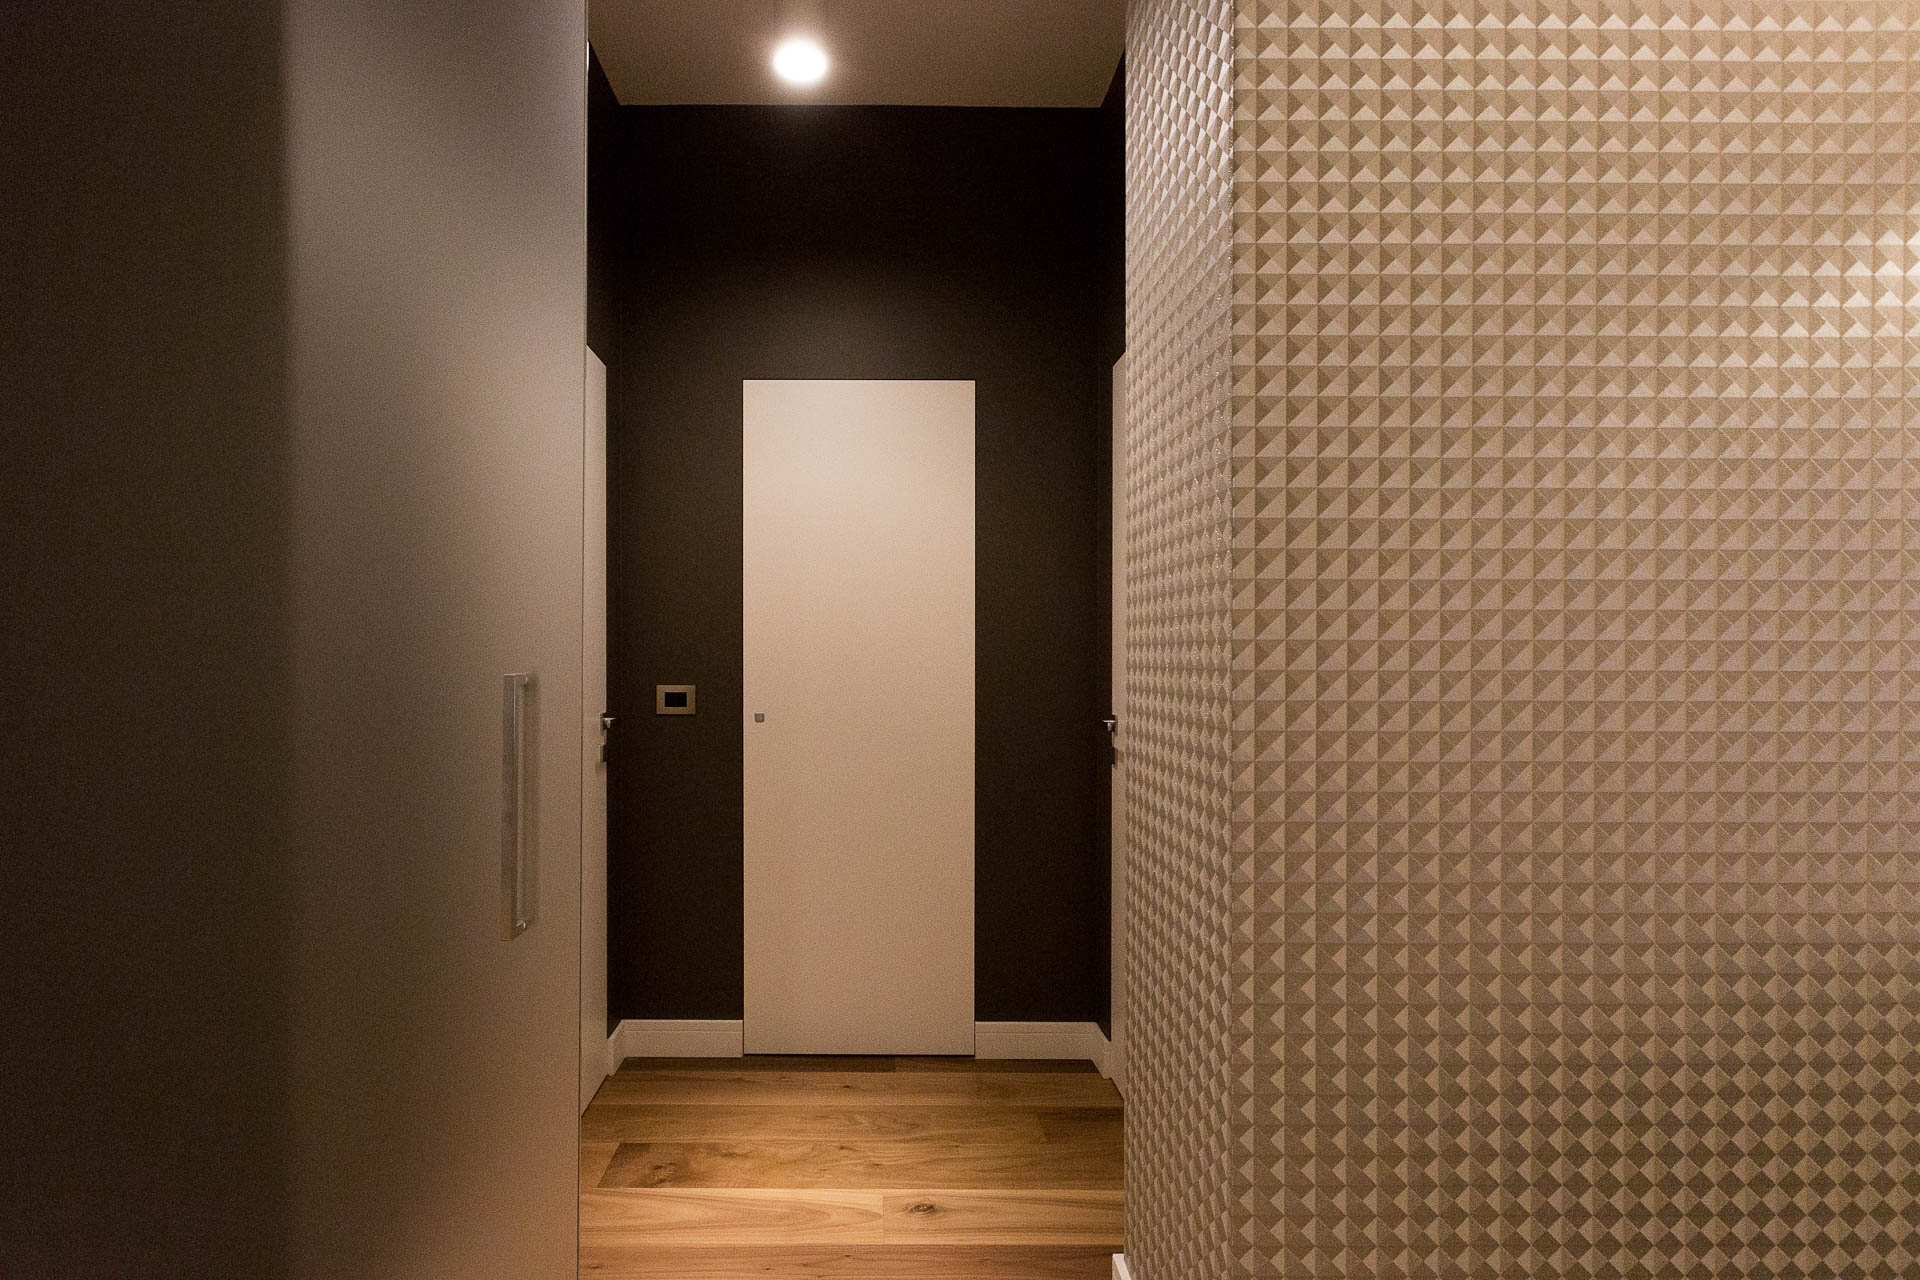 Glen_impresa edile_Appartamento 2_Simpol_00011